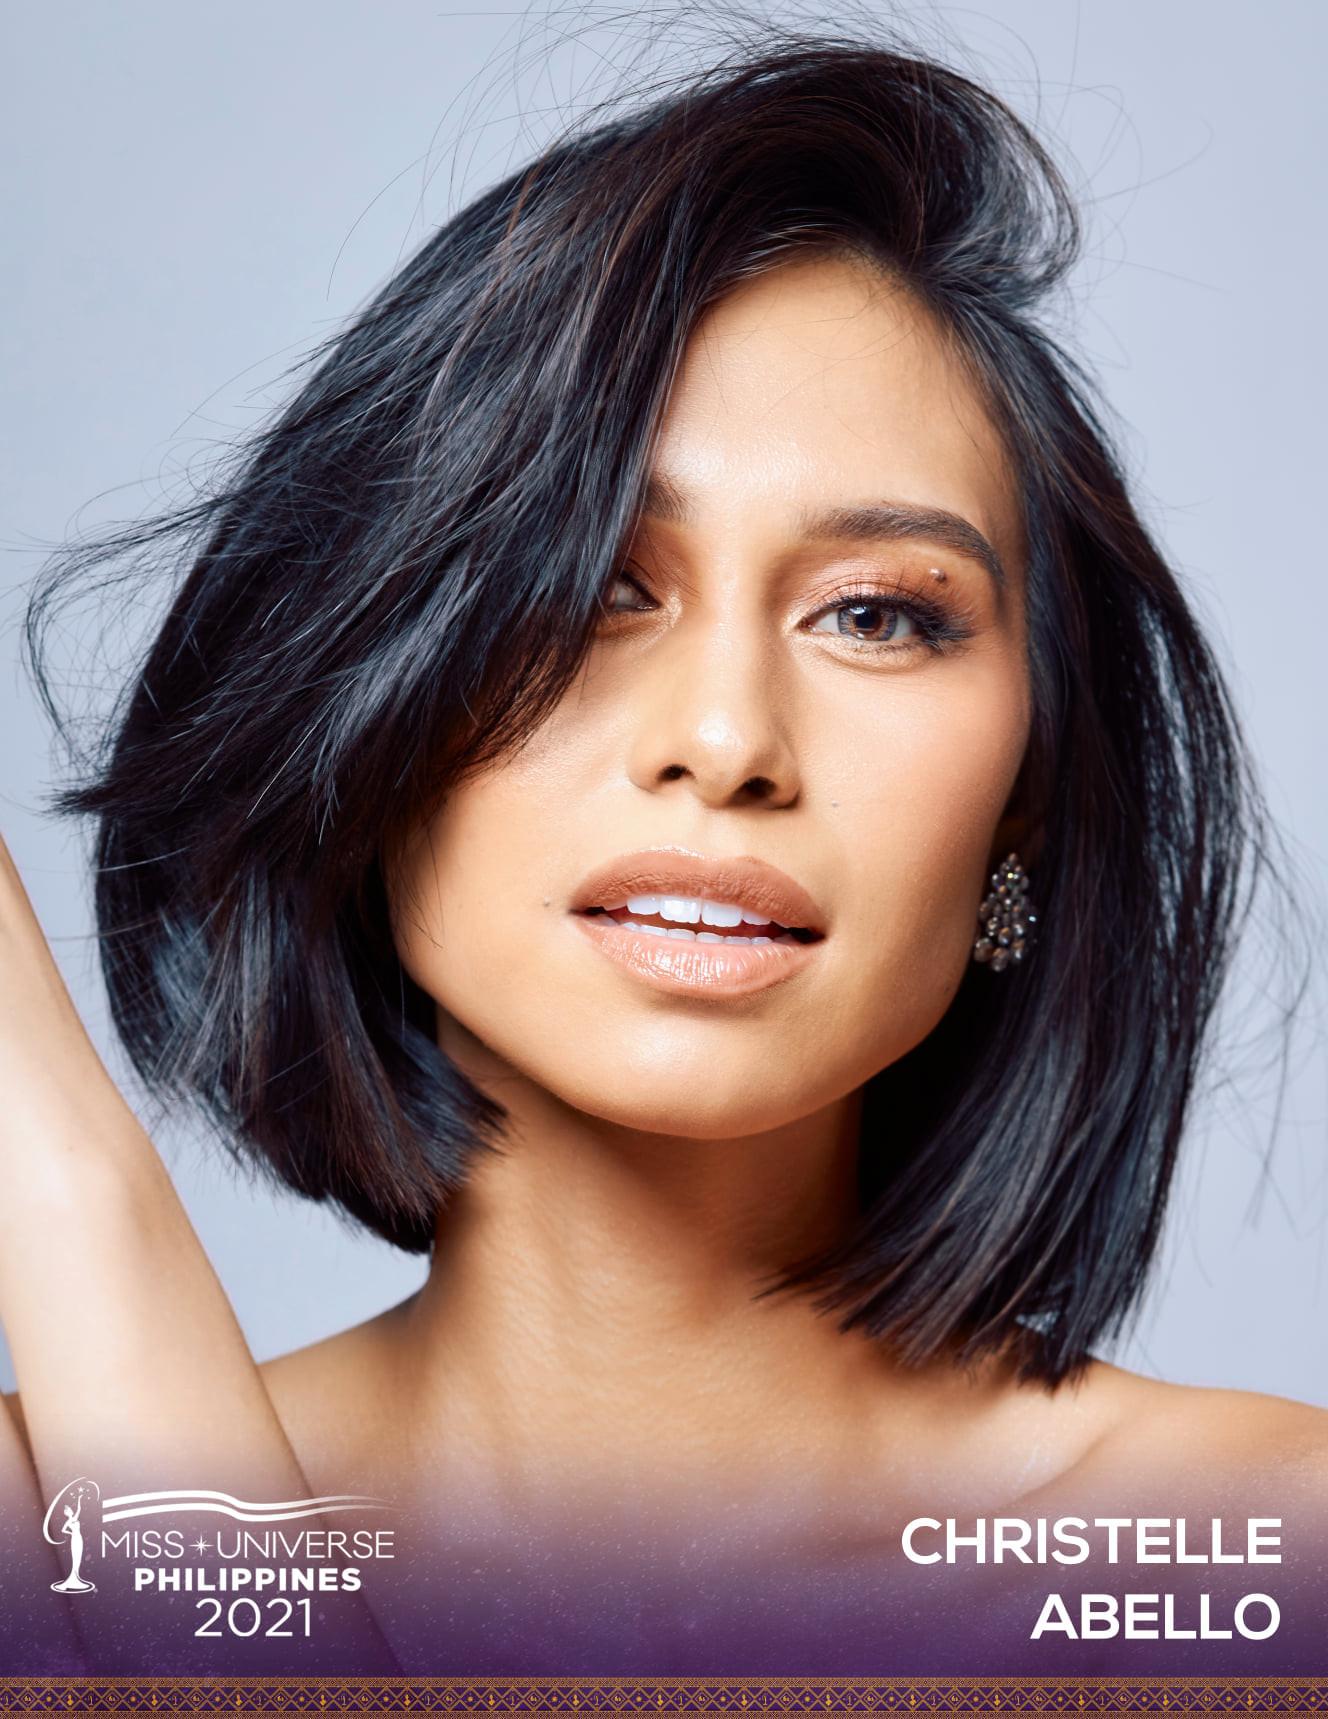 pre-candidatas a miss universe philippines 2021. - Página 3 AlqoaS